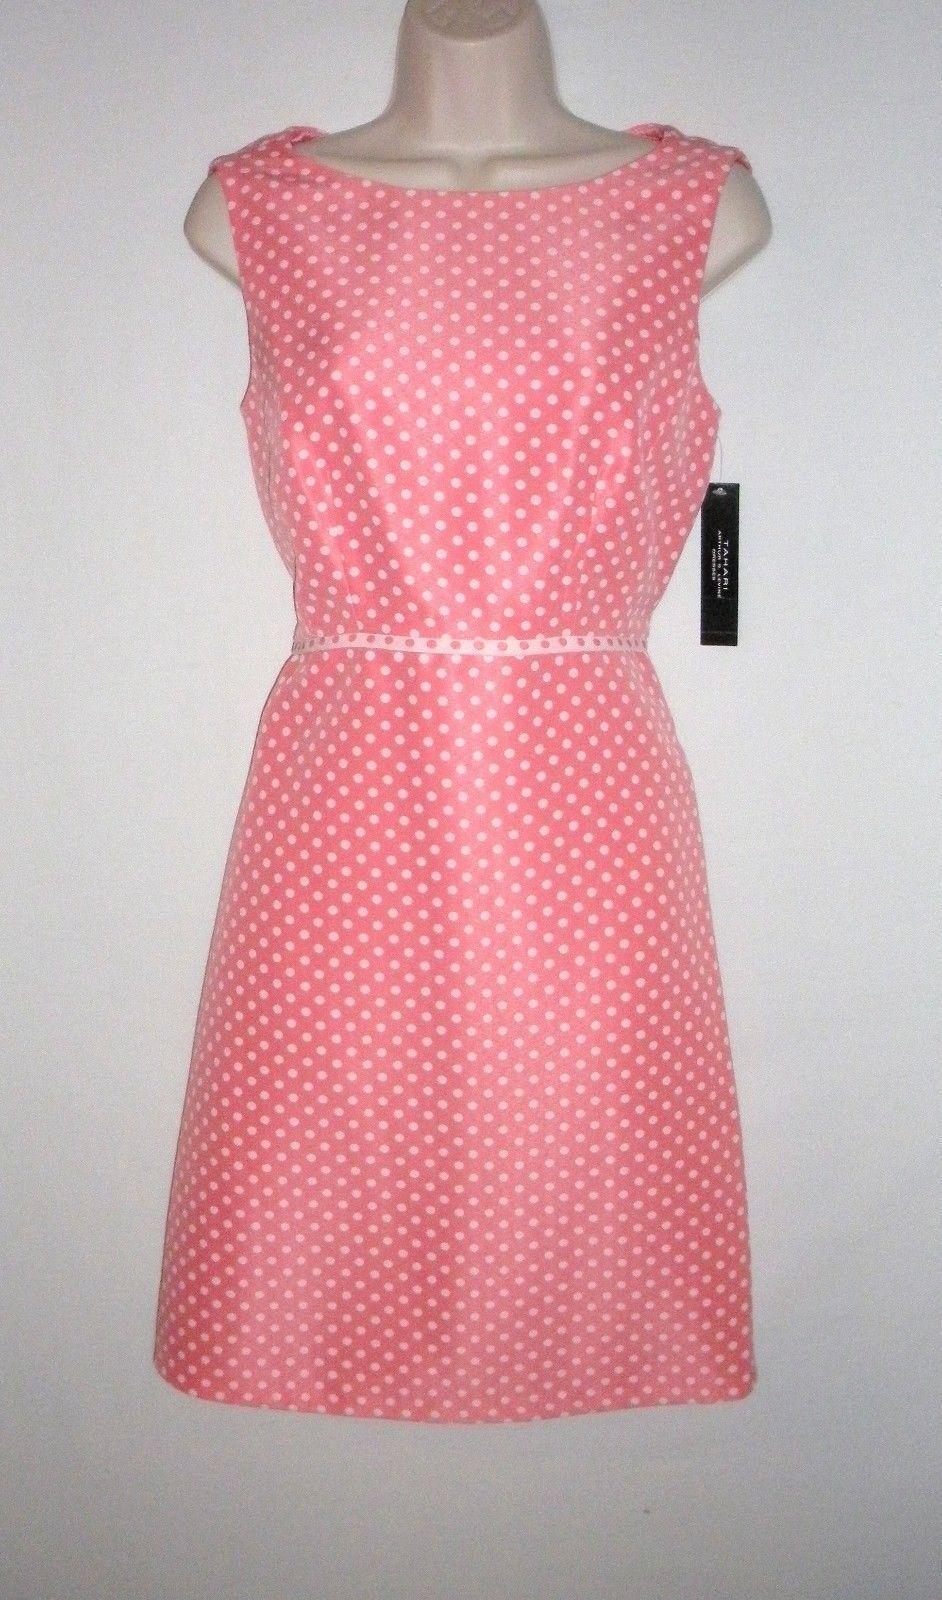 NWT MSRP  - TAHARI by ASL Polka Dot Shift Dress, Coral Weiß,  6  8  12  16